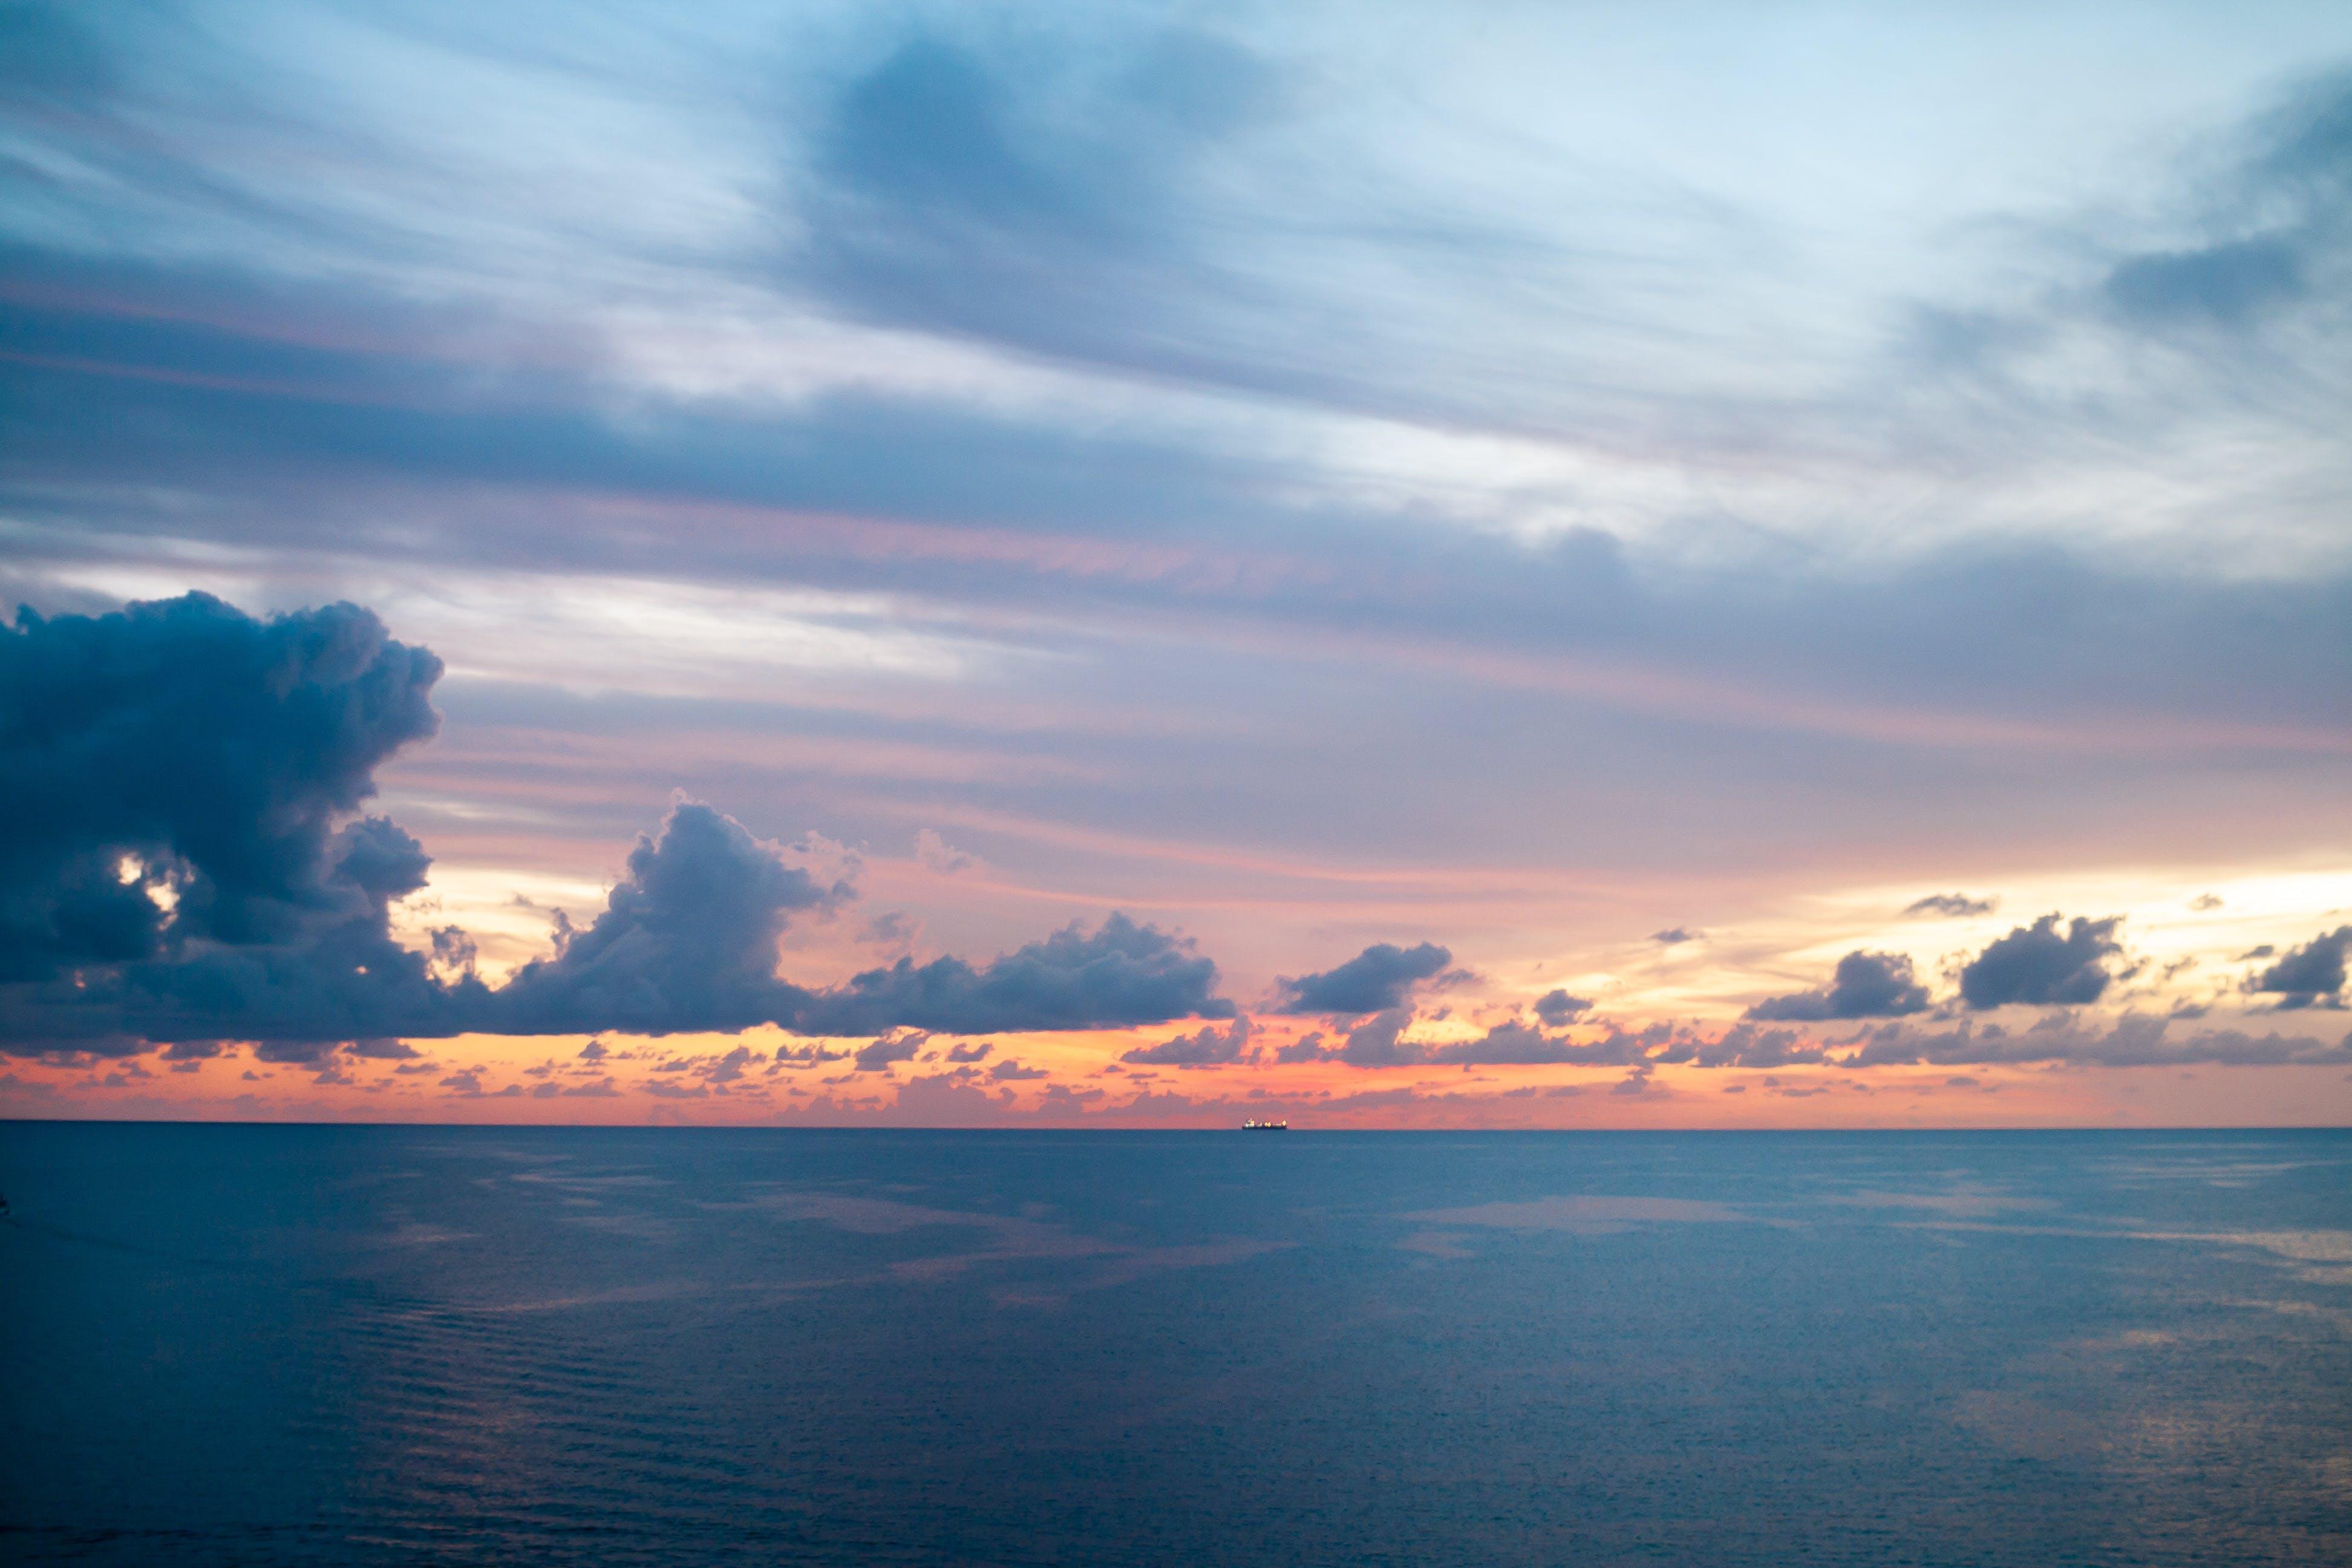 Fotos de stock gratuitas de agua, aguas calmadas, amanecer, bonito